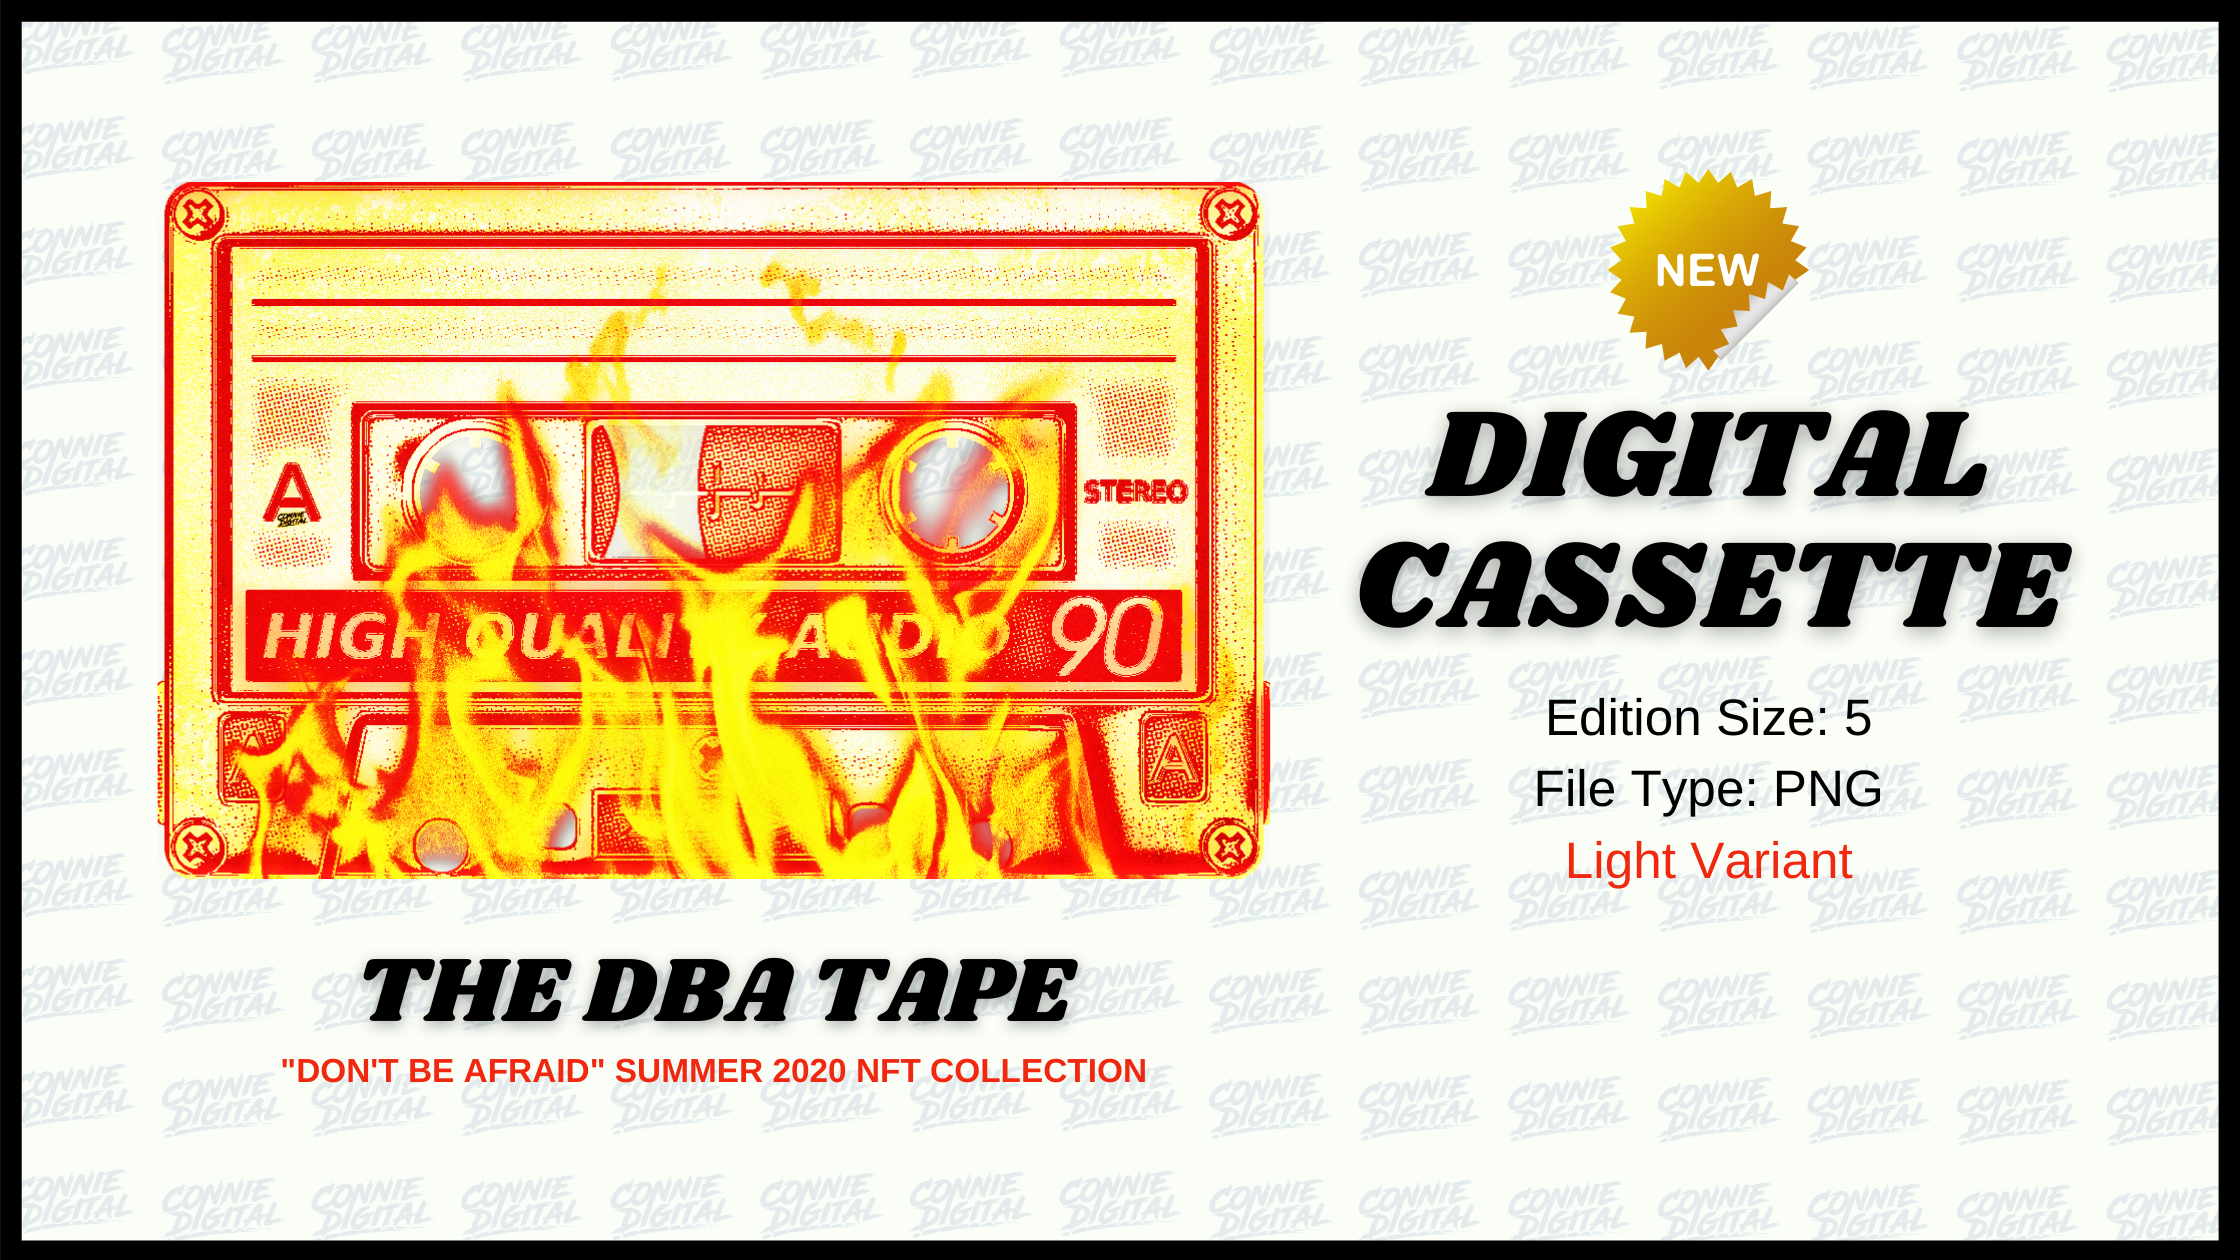 Digital Cassette Collection 2020 - Connie Digital Dont Be Afraid